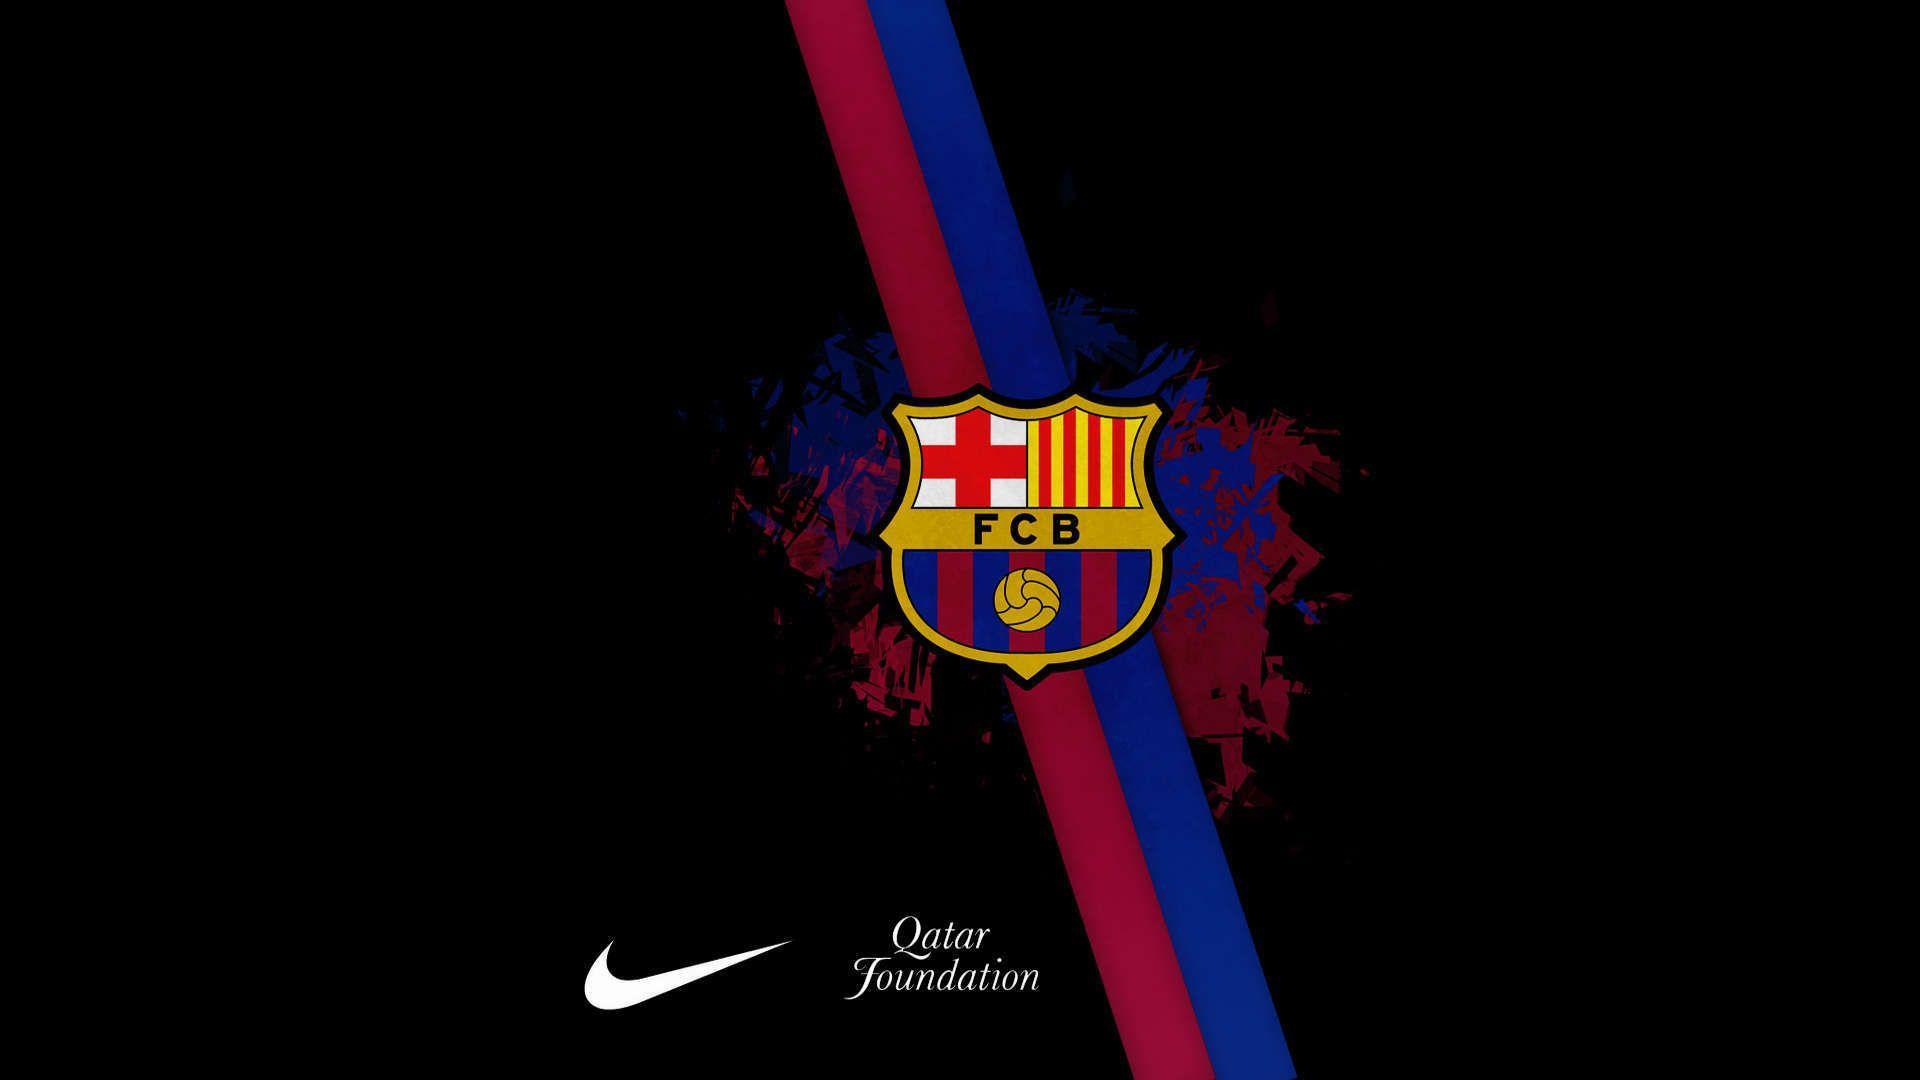 FC Barcelona Logo Wallpaper Download | HD Wallpapers, Backgrounds ...